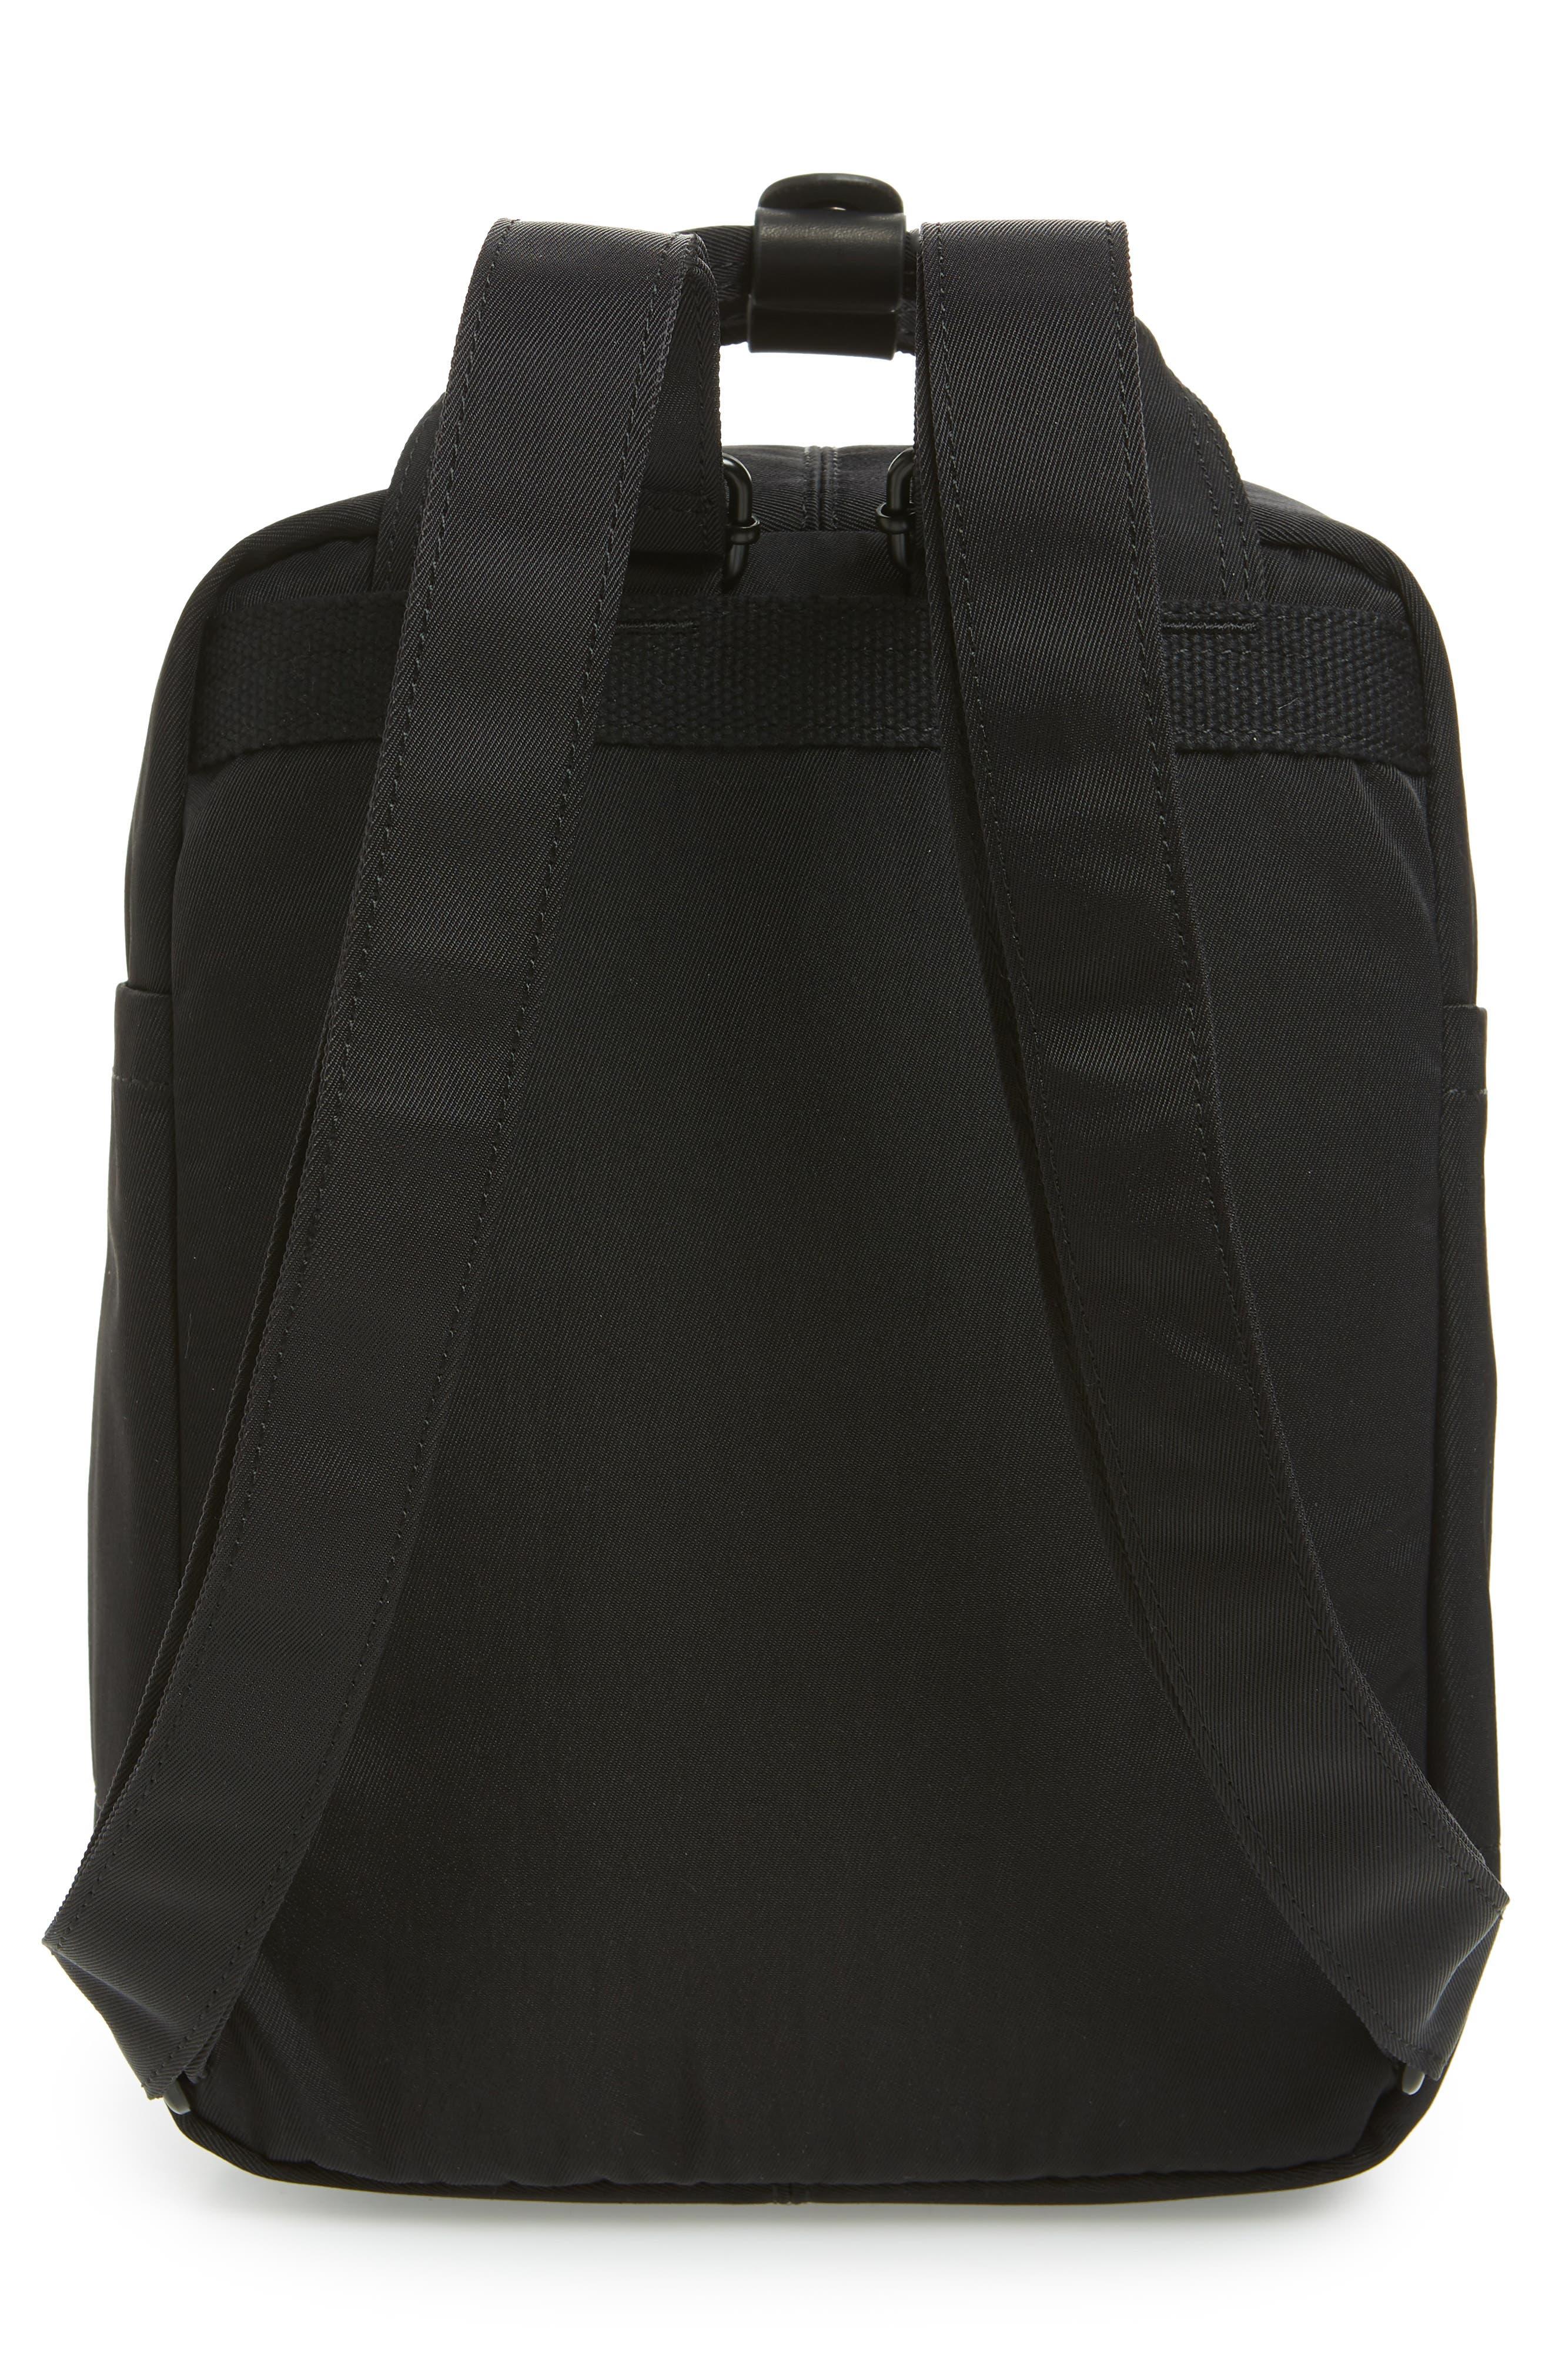 Mini Macaroon Black Series Water Resistant Backpack,                             Alternate thumbnail 5, color,                             Black